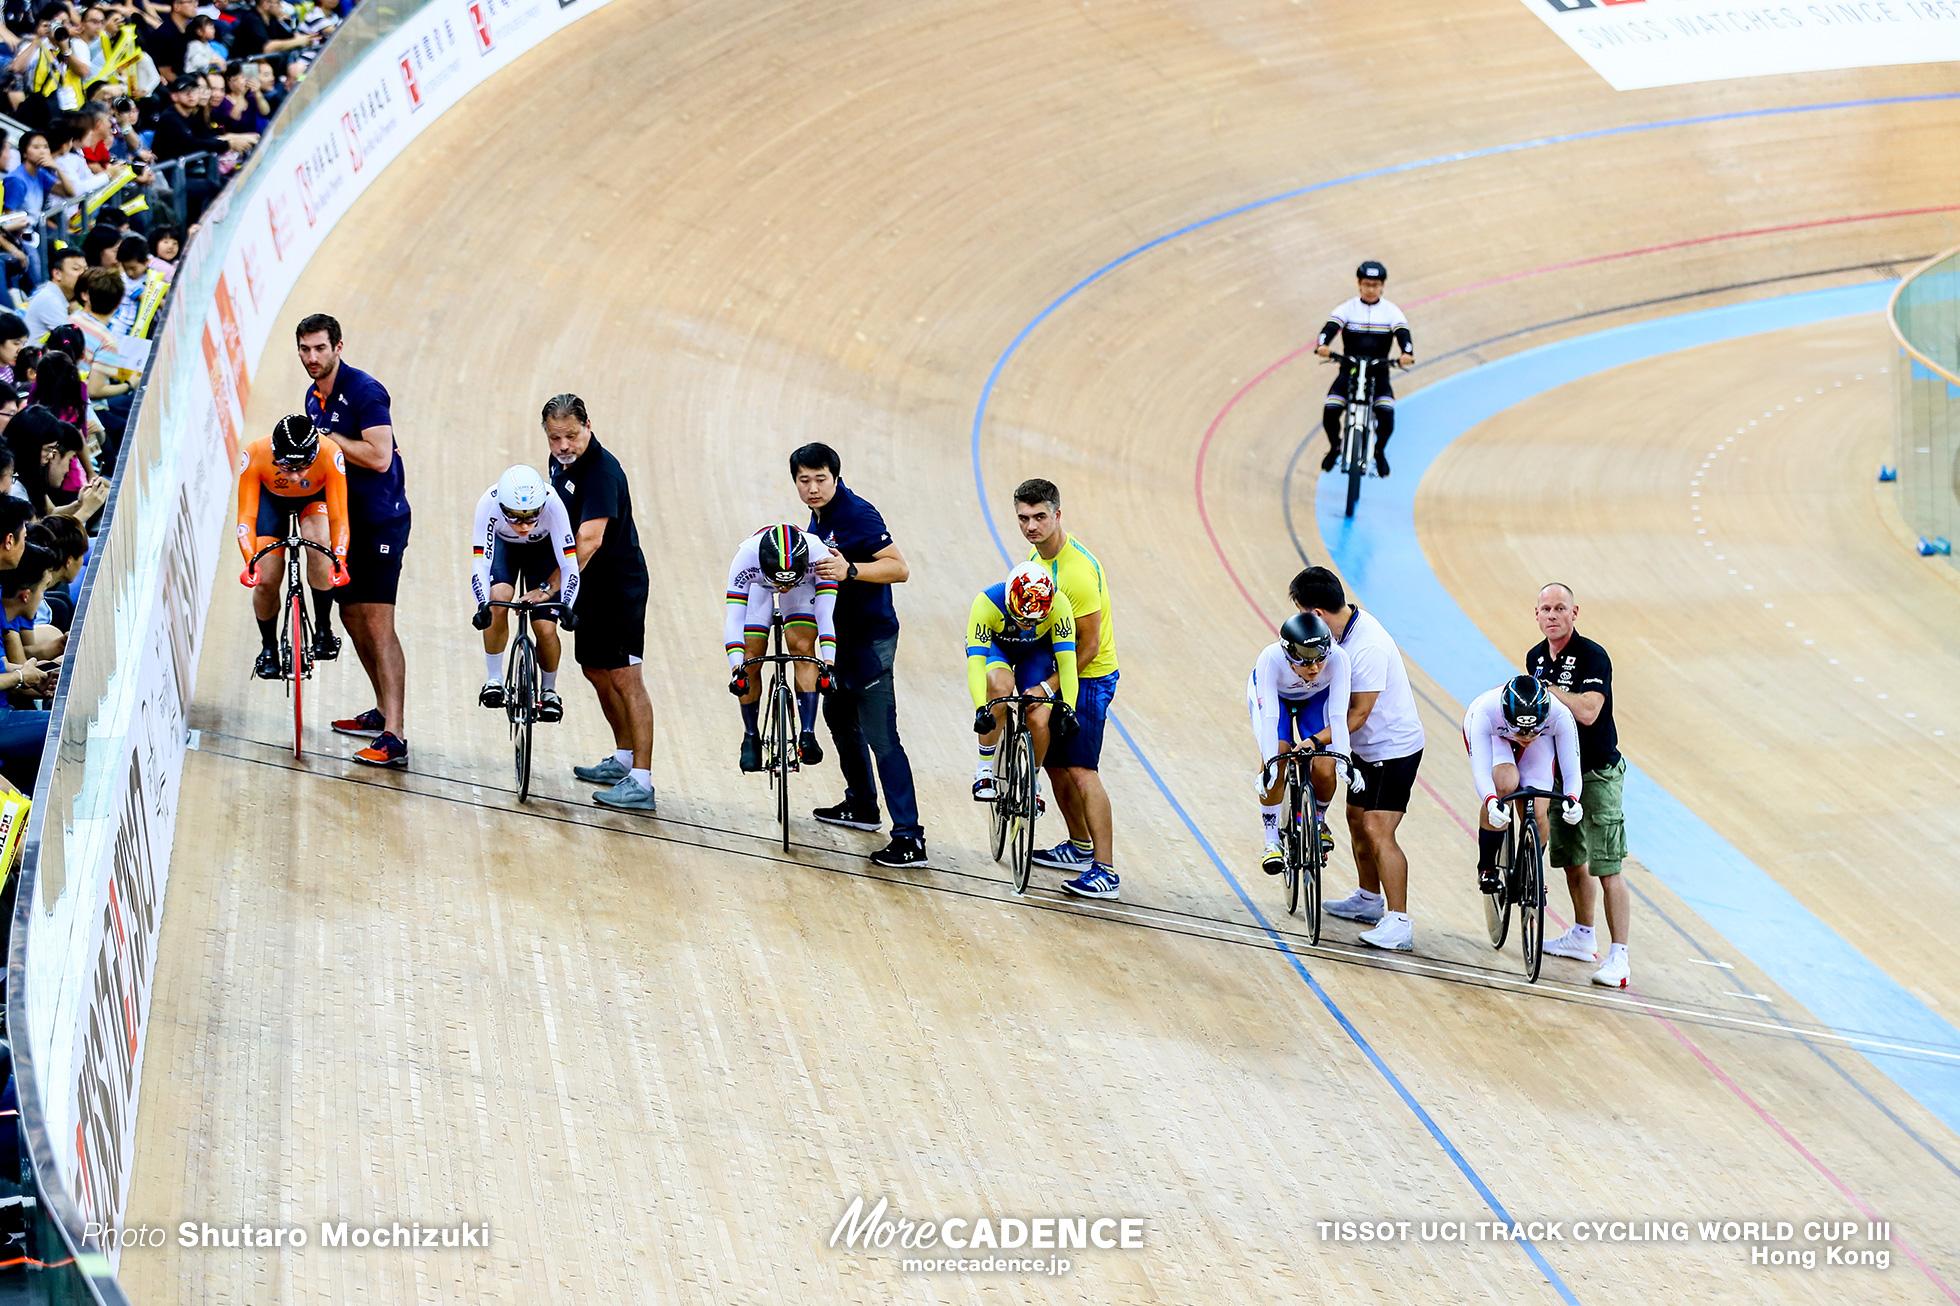 Final / Women's Keirin / TISSOT UCI TRACK CYCLING WORLD CUP III, Hong Kong